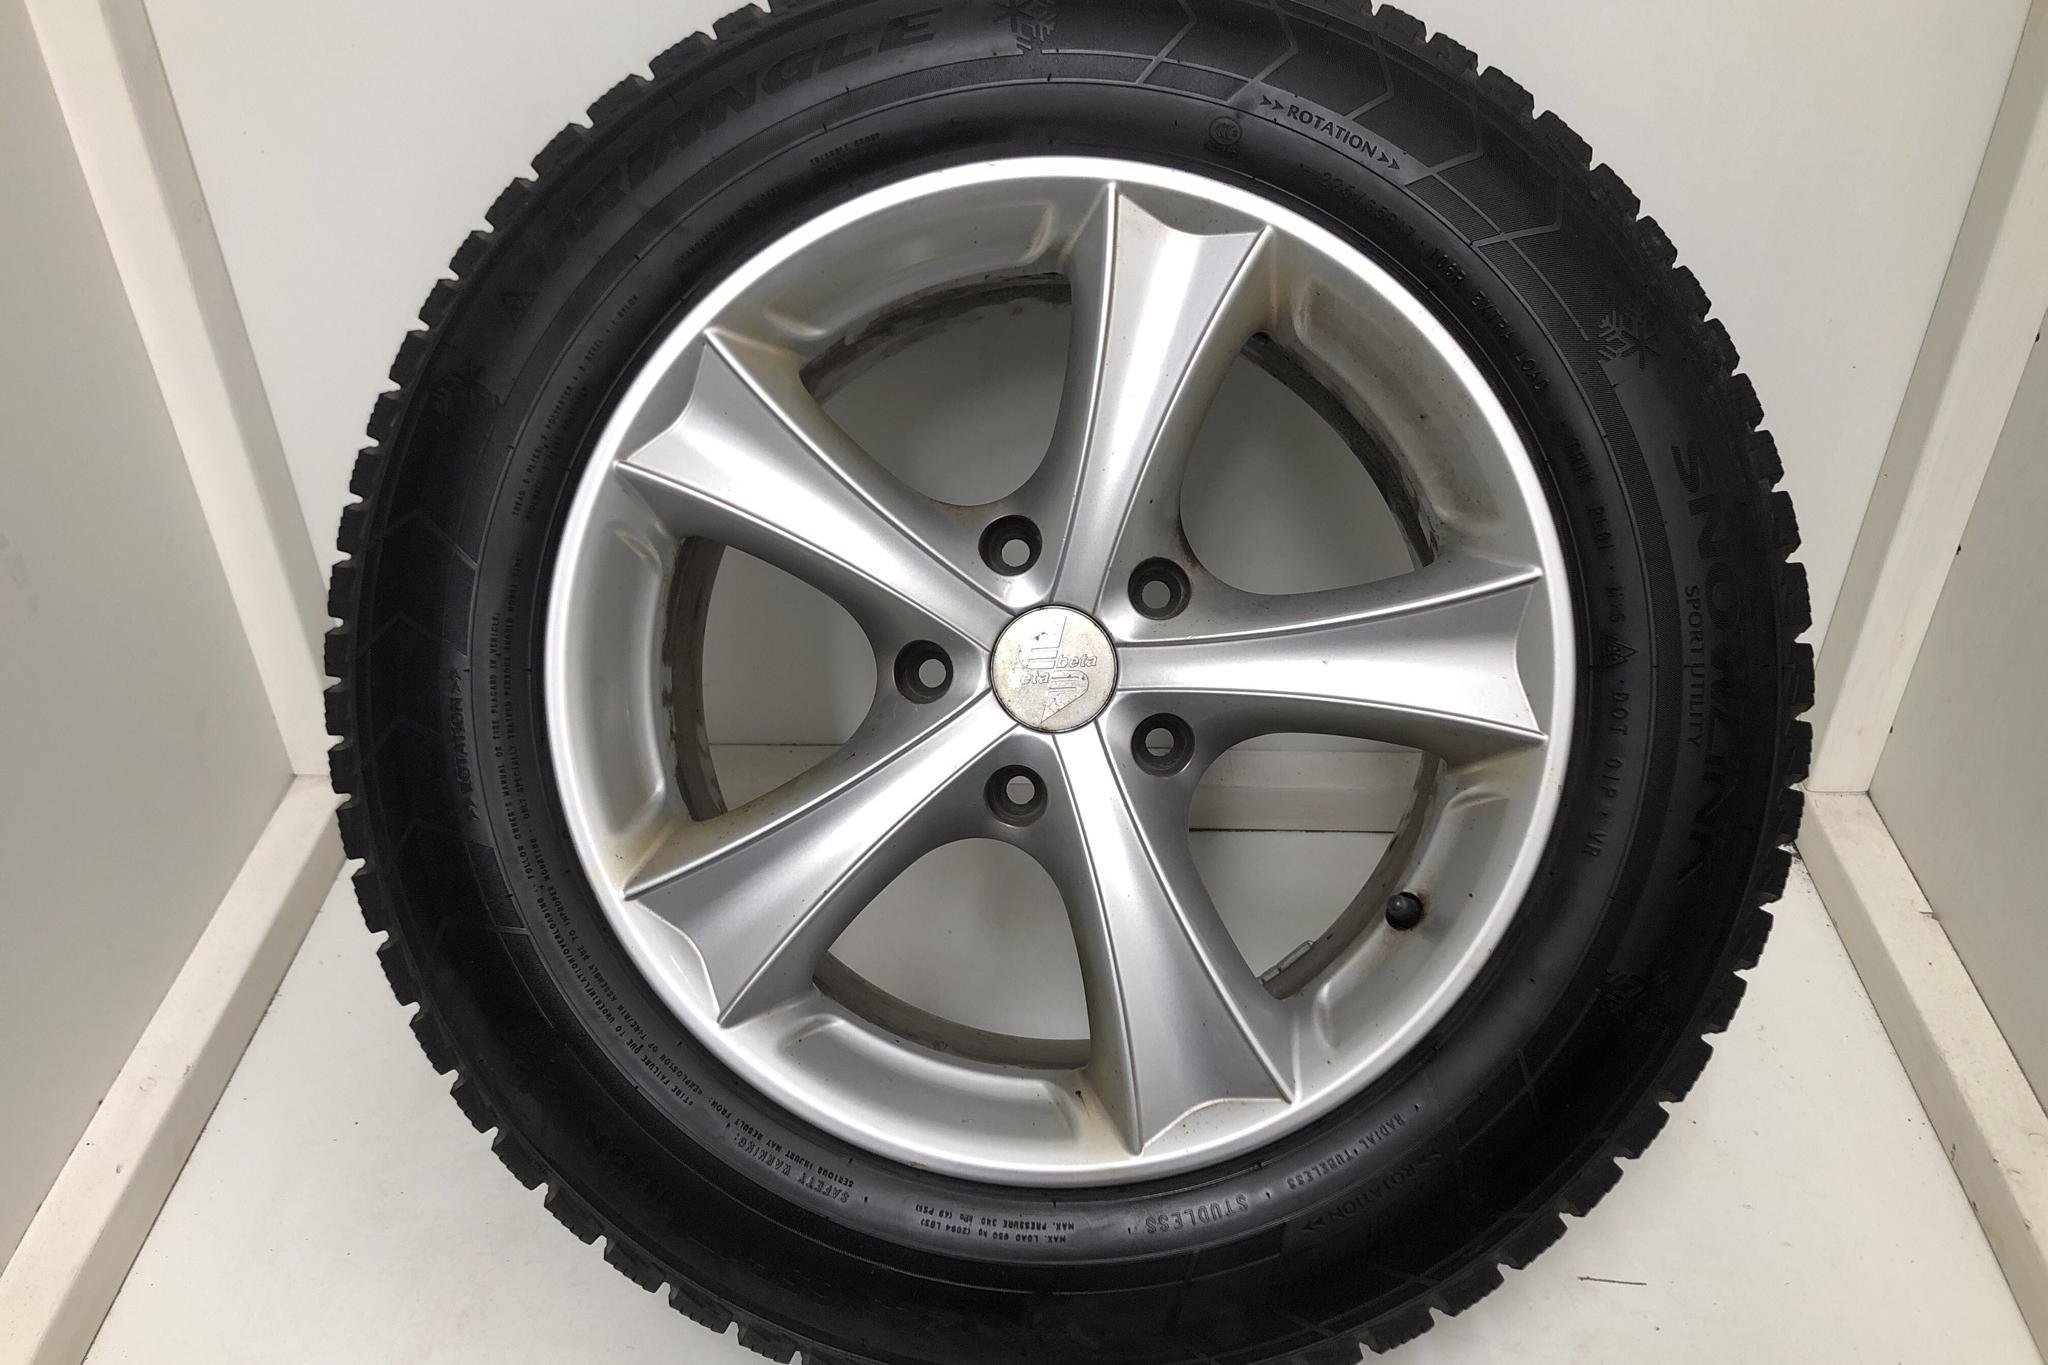 Fiat Freemont 2.0 Multijet AWD (170hk) - 15 137 mil - Automat - svart - 2013